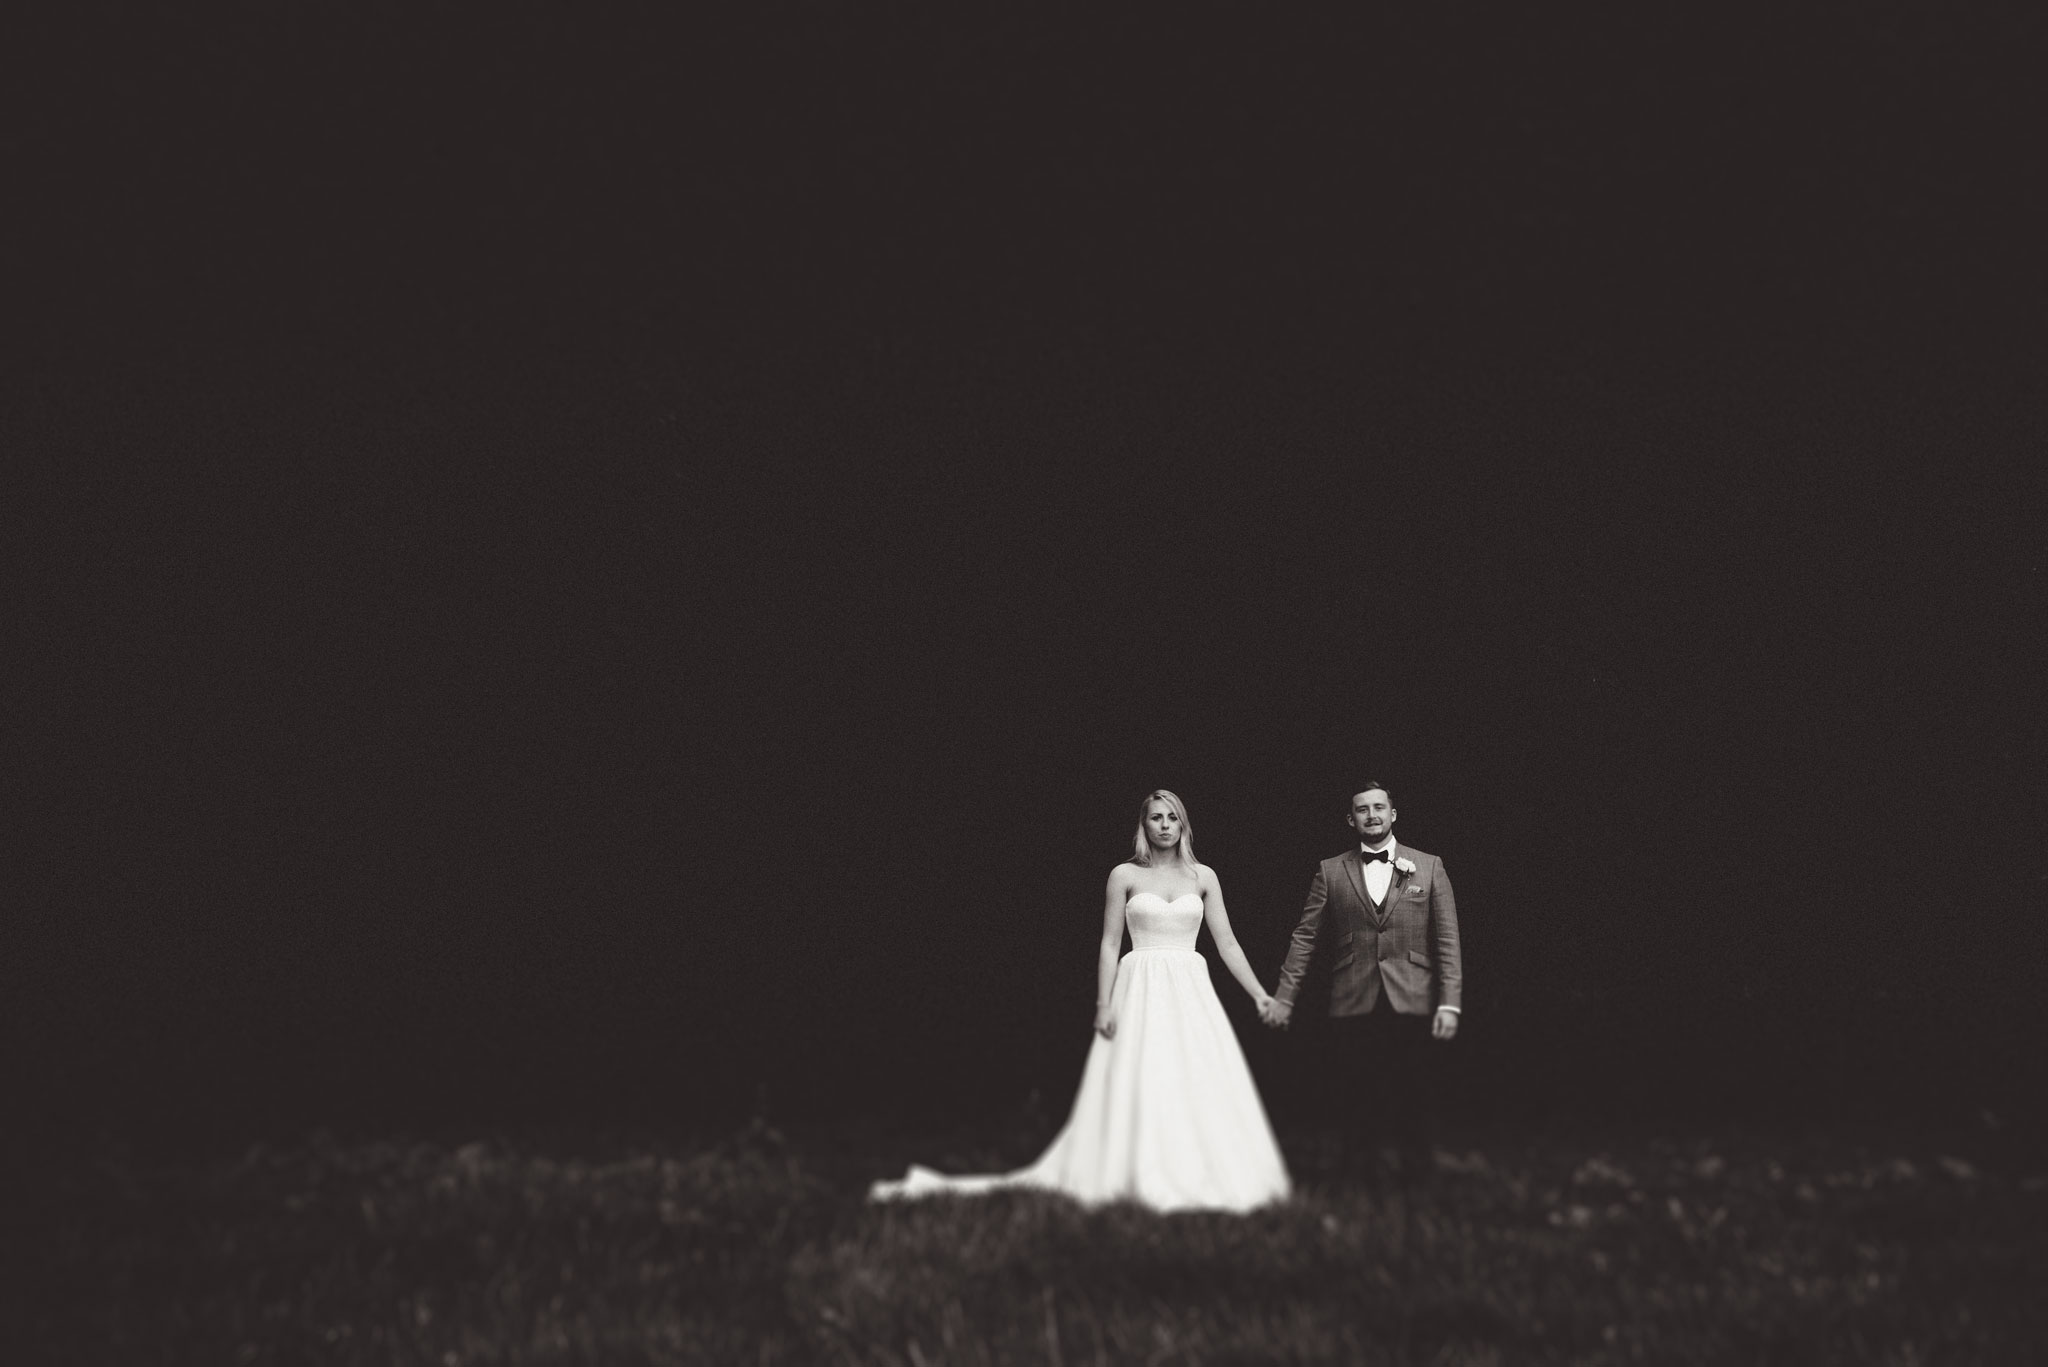 Josh and helen wedding at prior park in Bath somerset